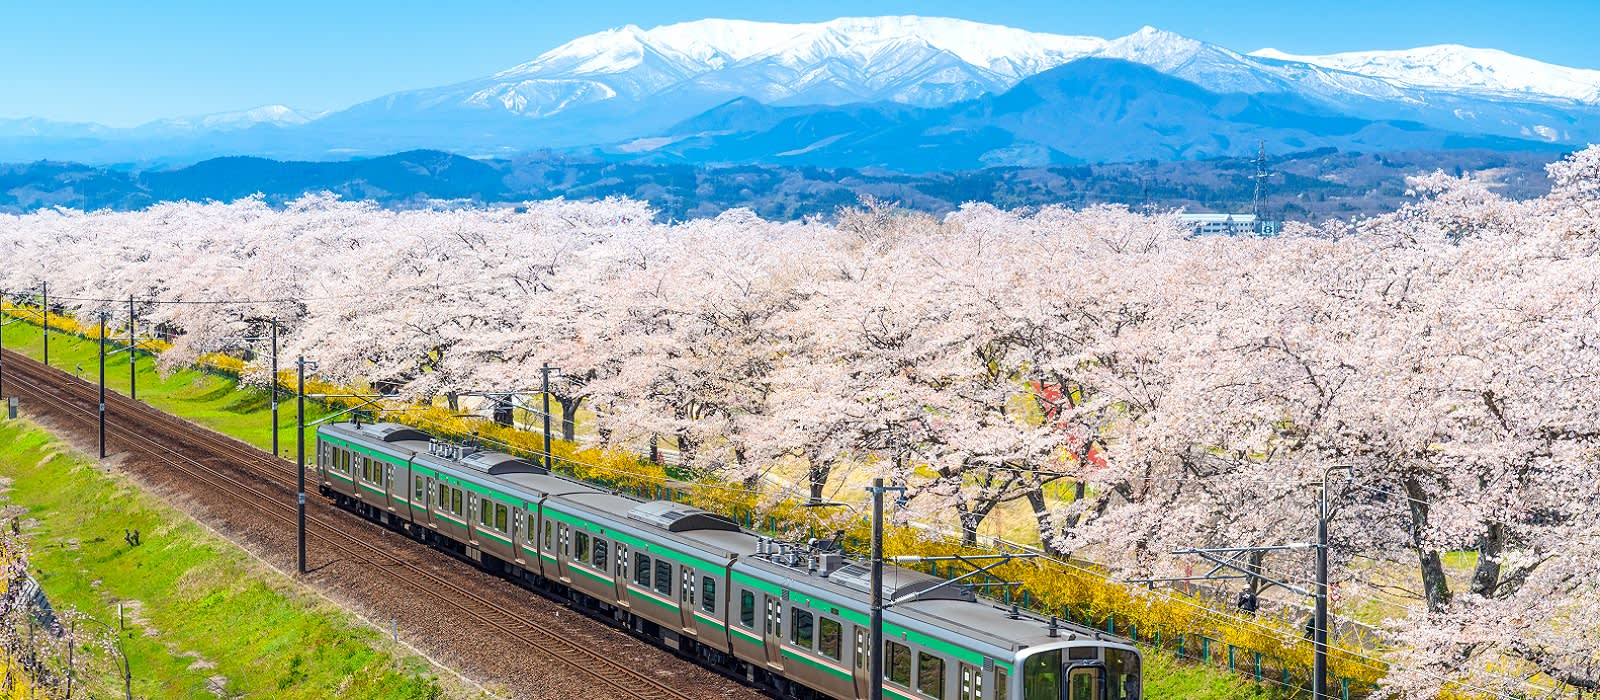 Japan Bahnreise – Alle Highlights mit dem JR Rail Pass Urlaub 1